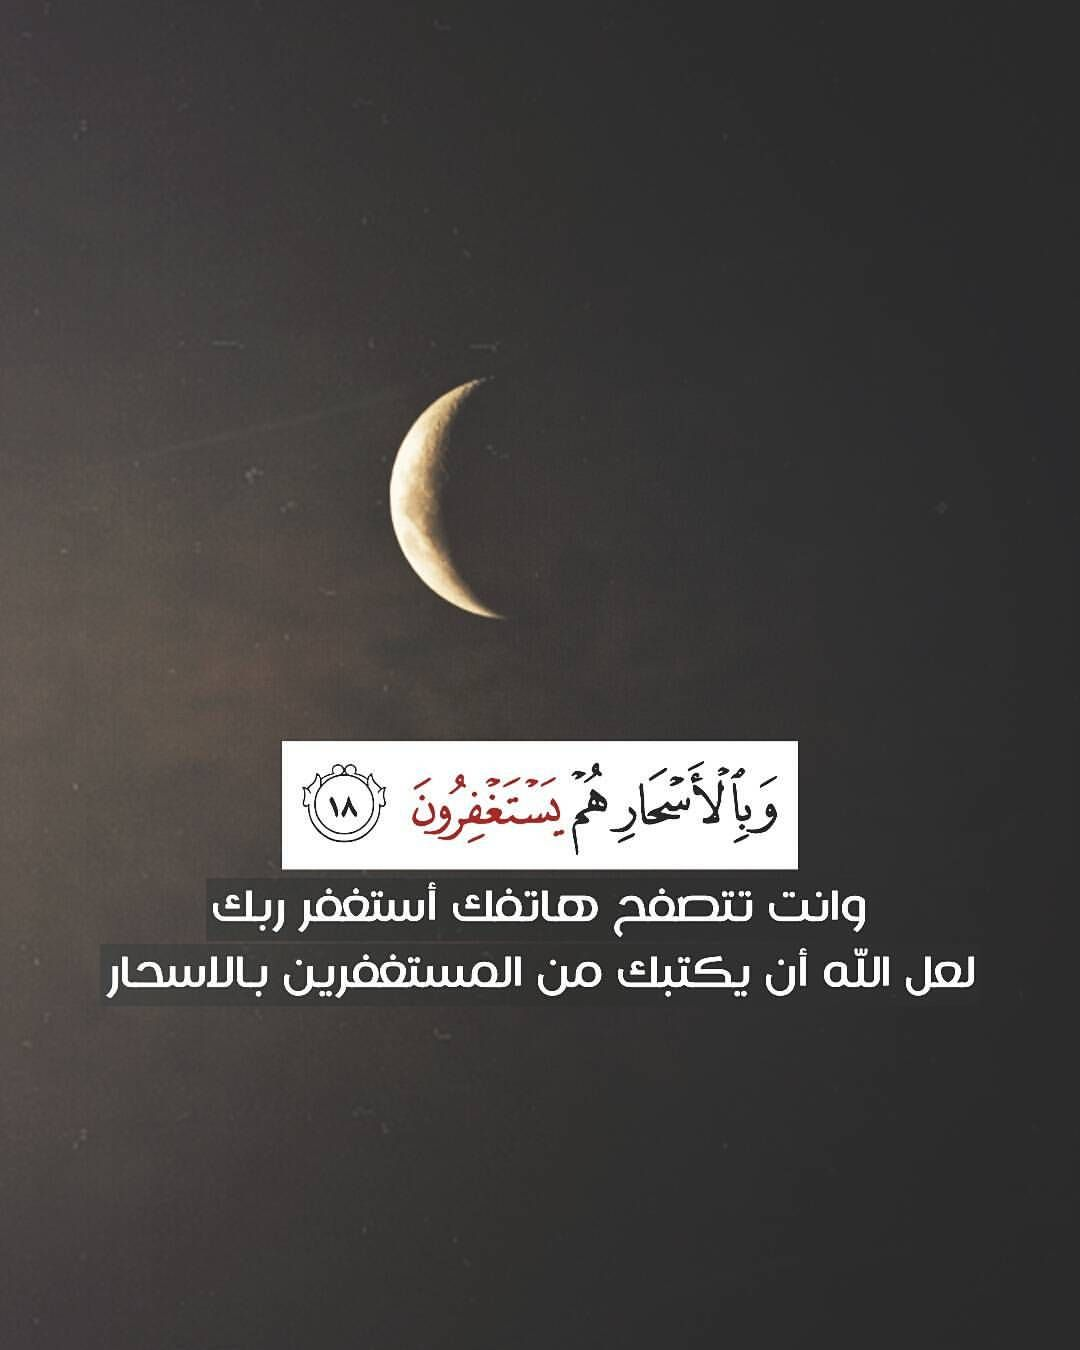 Pin By عائشة الاغا On وما كان الله معذبهم وهم يستغفرون Quran Quotes Islamic Quotes Quotes